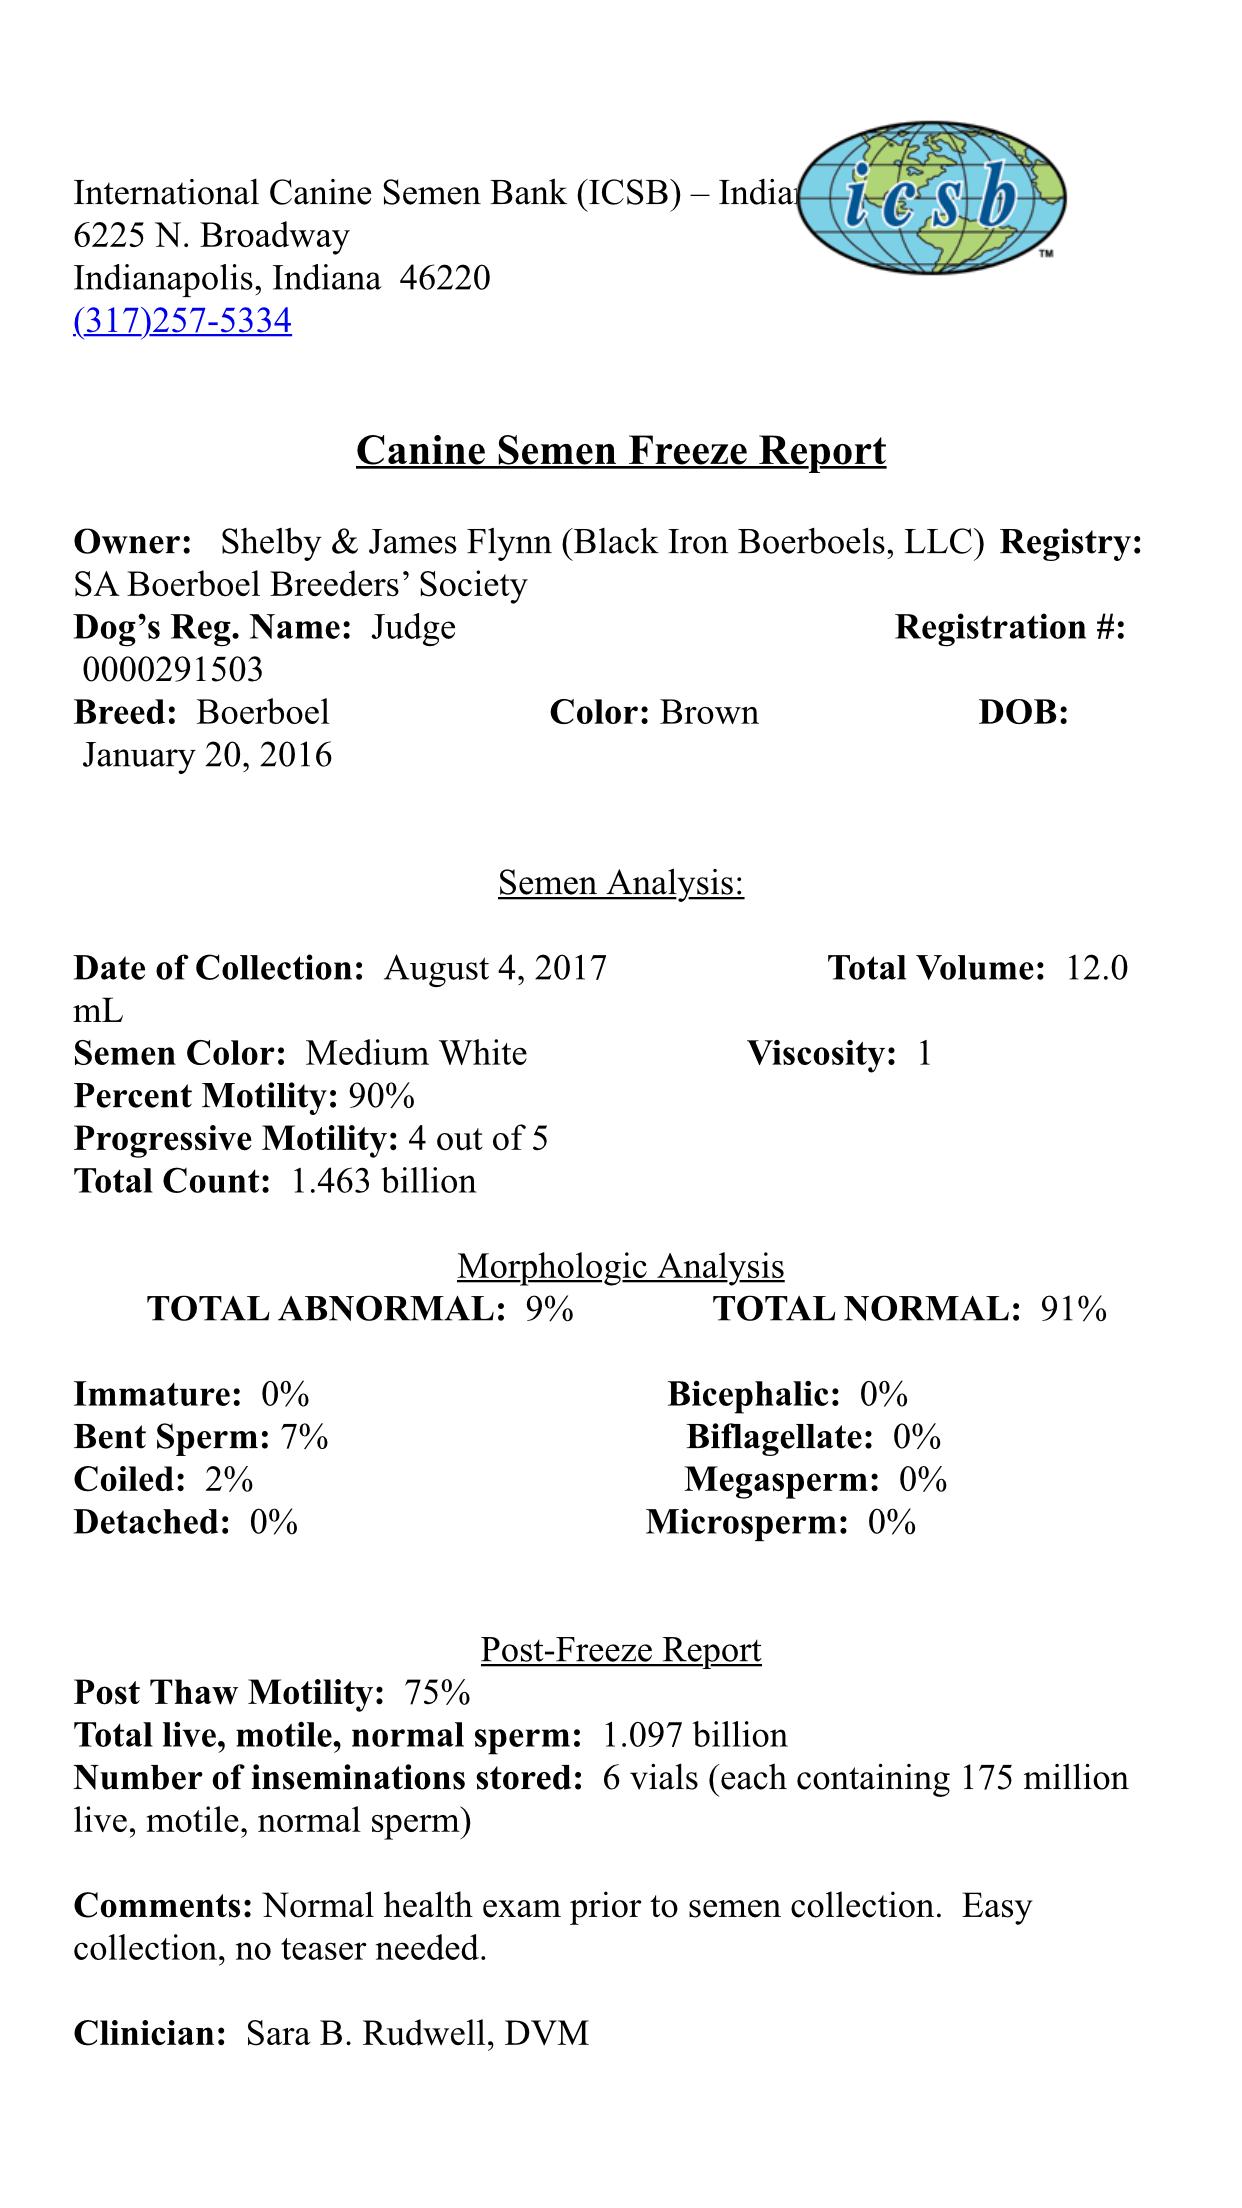 Judge - Black Iron Boerboels LLC